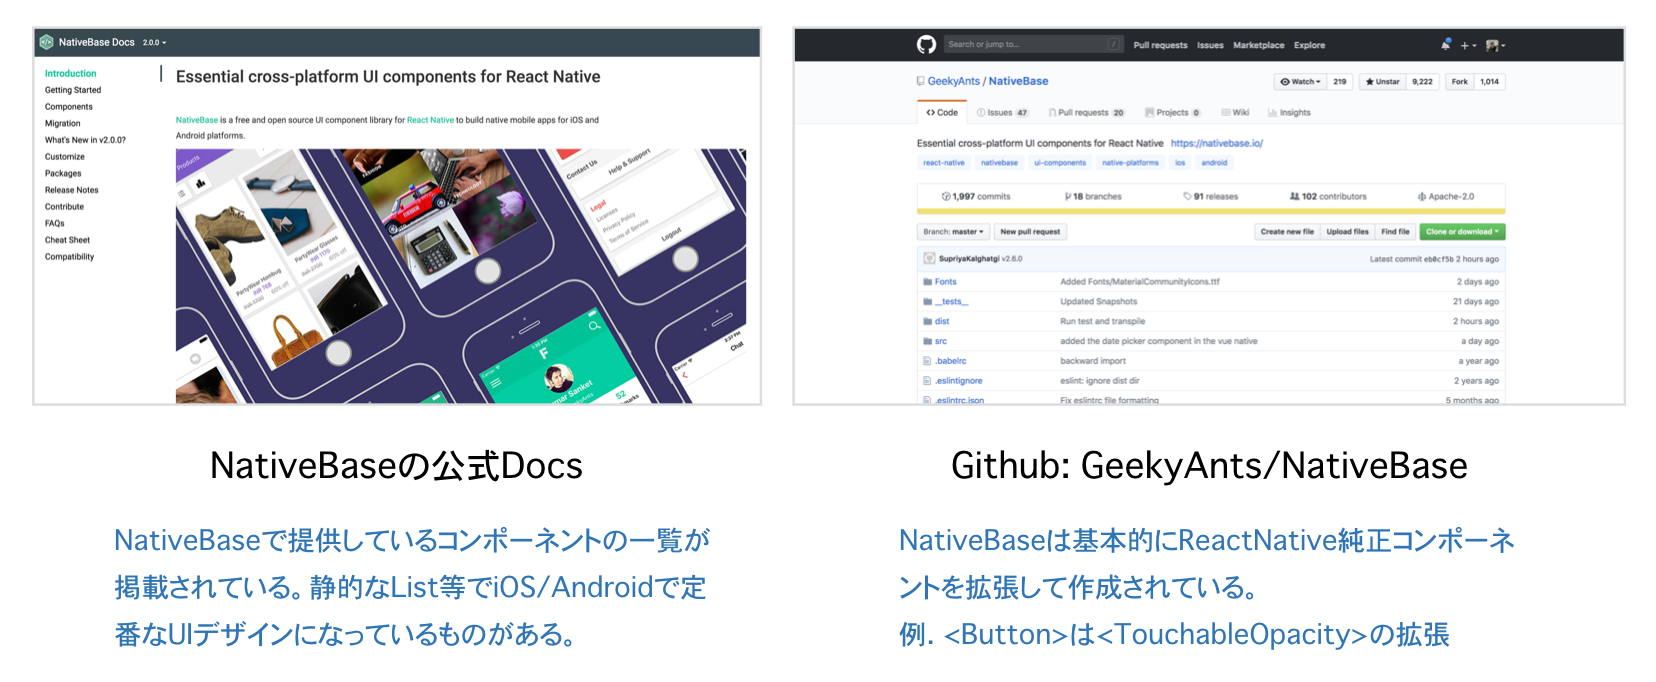 nativebase_reference.png